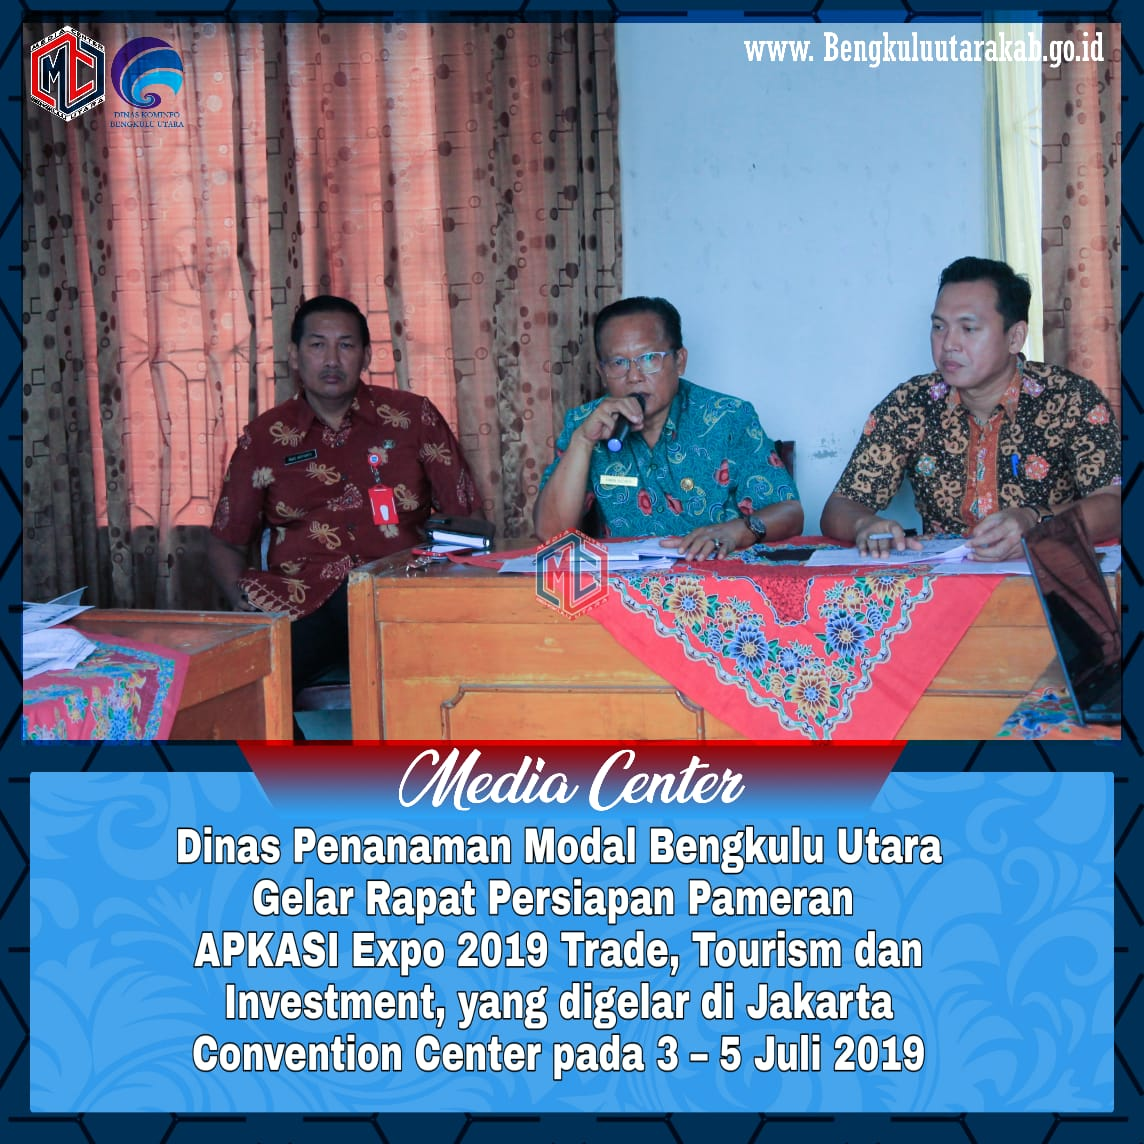 Dinas Penanaman Modal Bengkulu Utara Gelar Rapat Persiapan Pameran APKASI Expo 2019